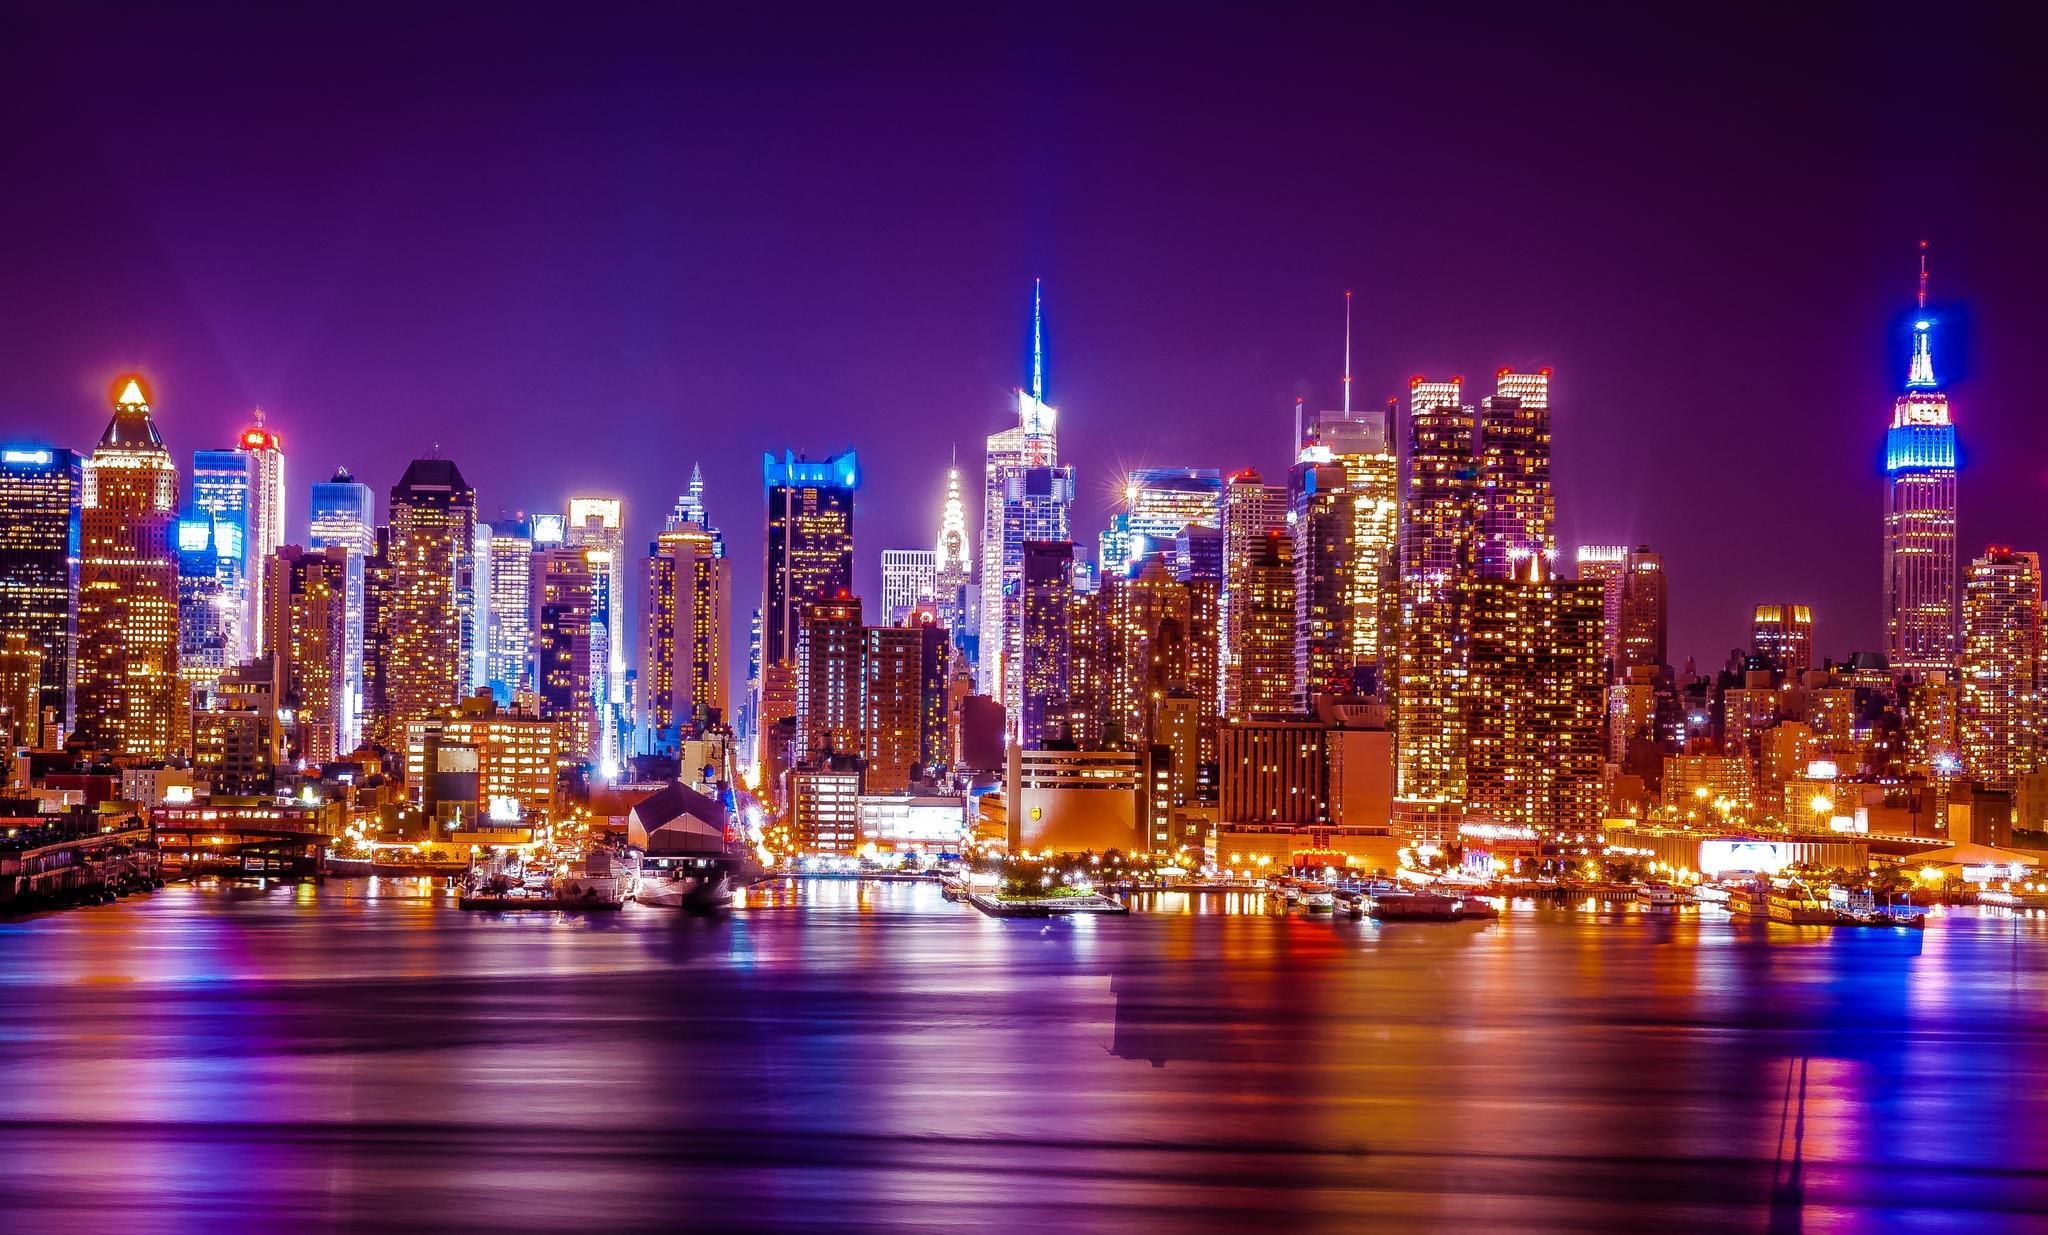 New York City Wallpaper Pexels Free Stock Photos 2048x1235